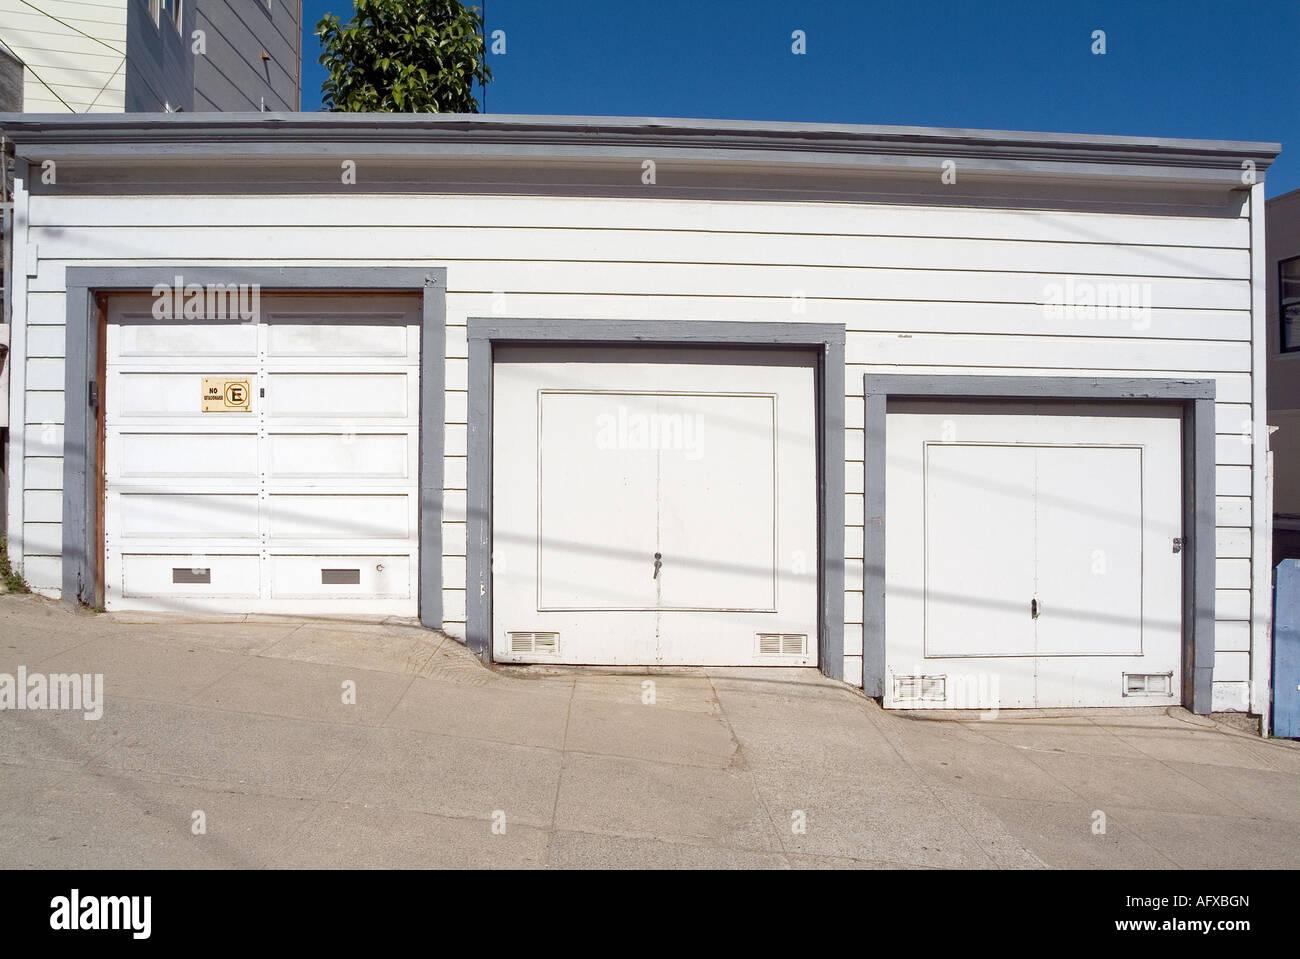 Elegant Drei Garagentore. Russian Hill Gegend. In San Francisco. Kalifornien. USA  Stockbild